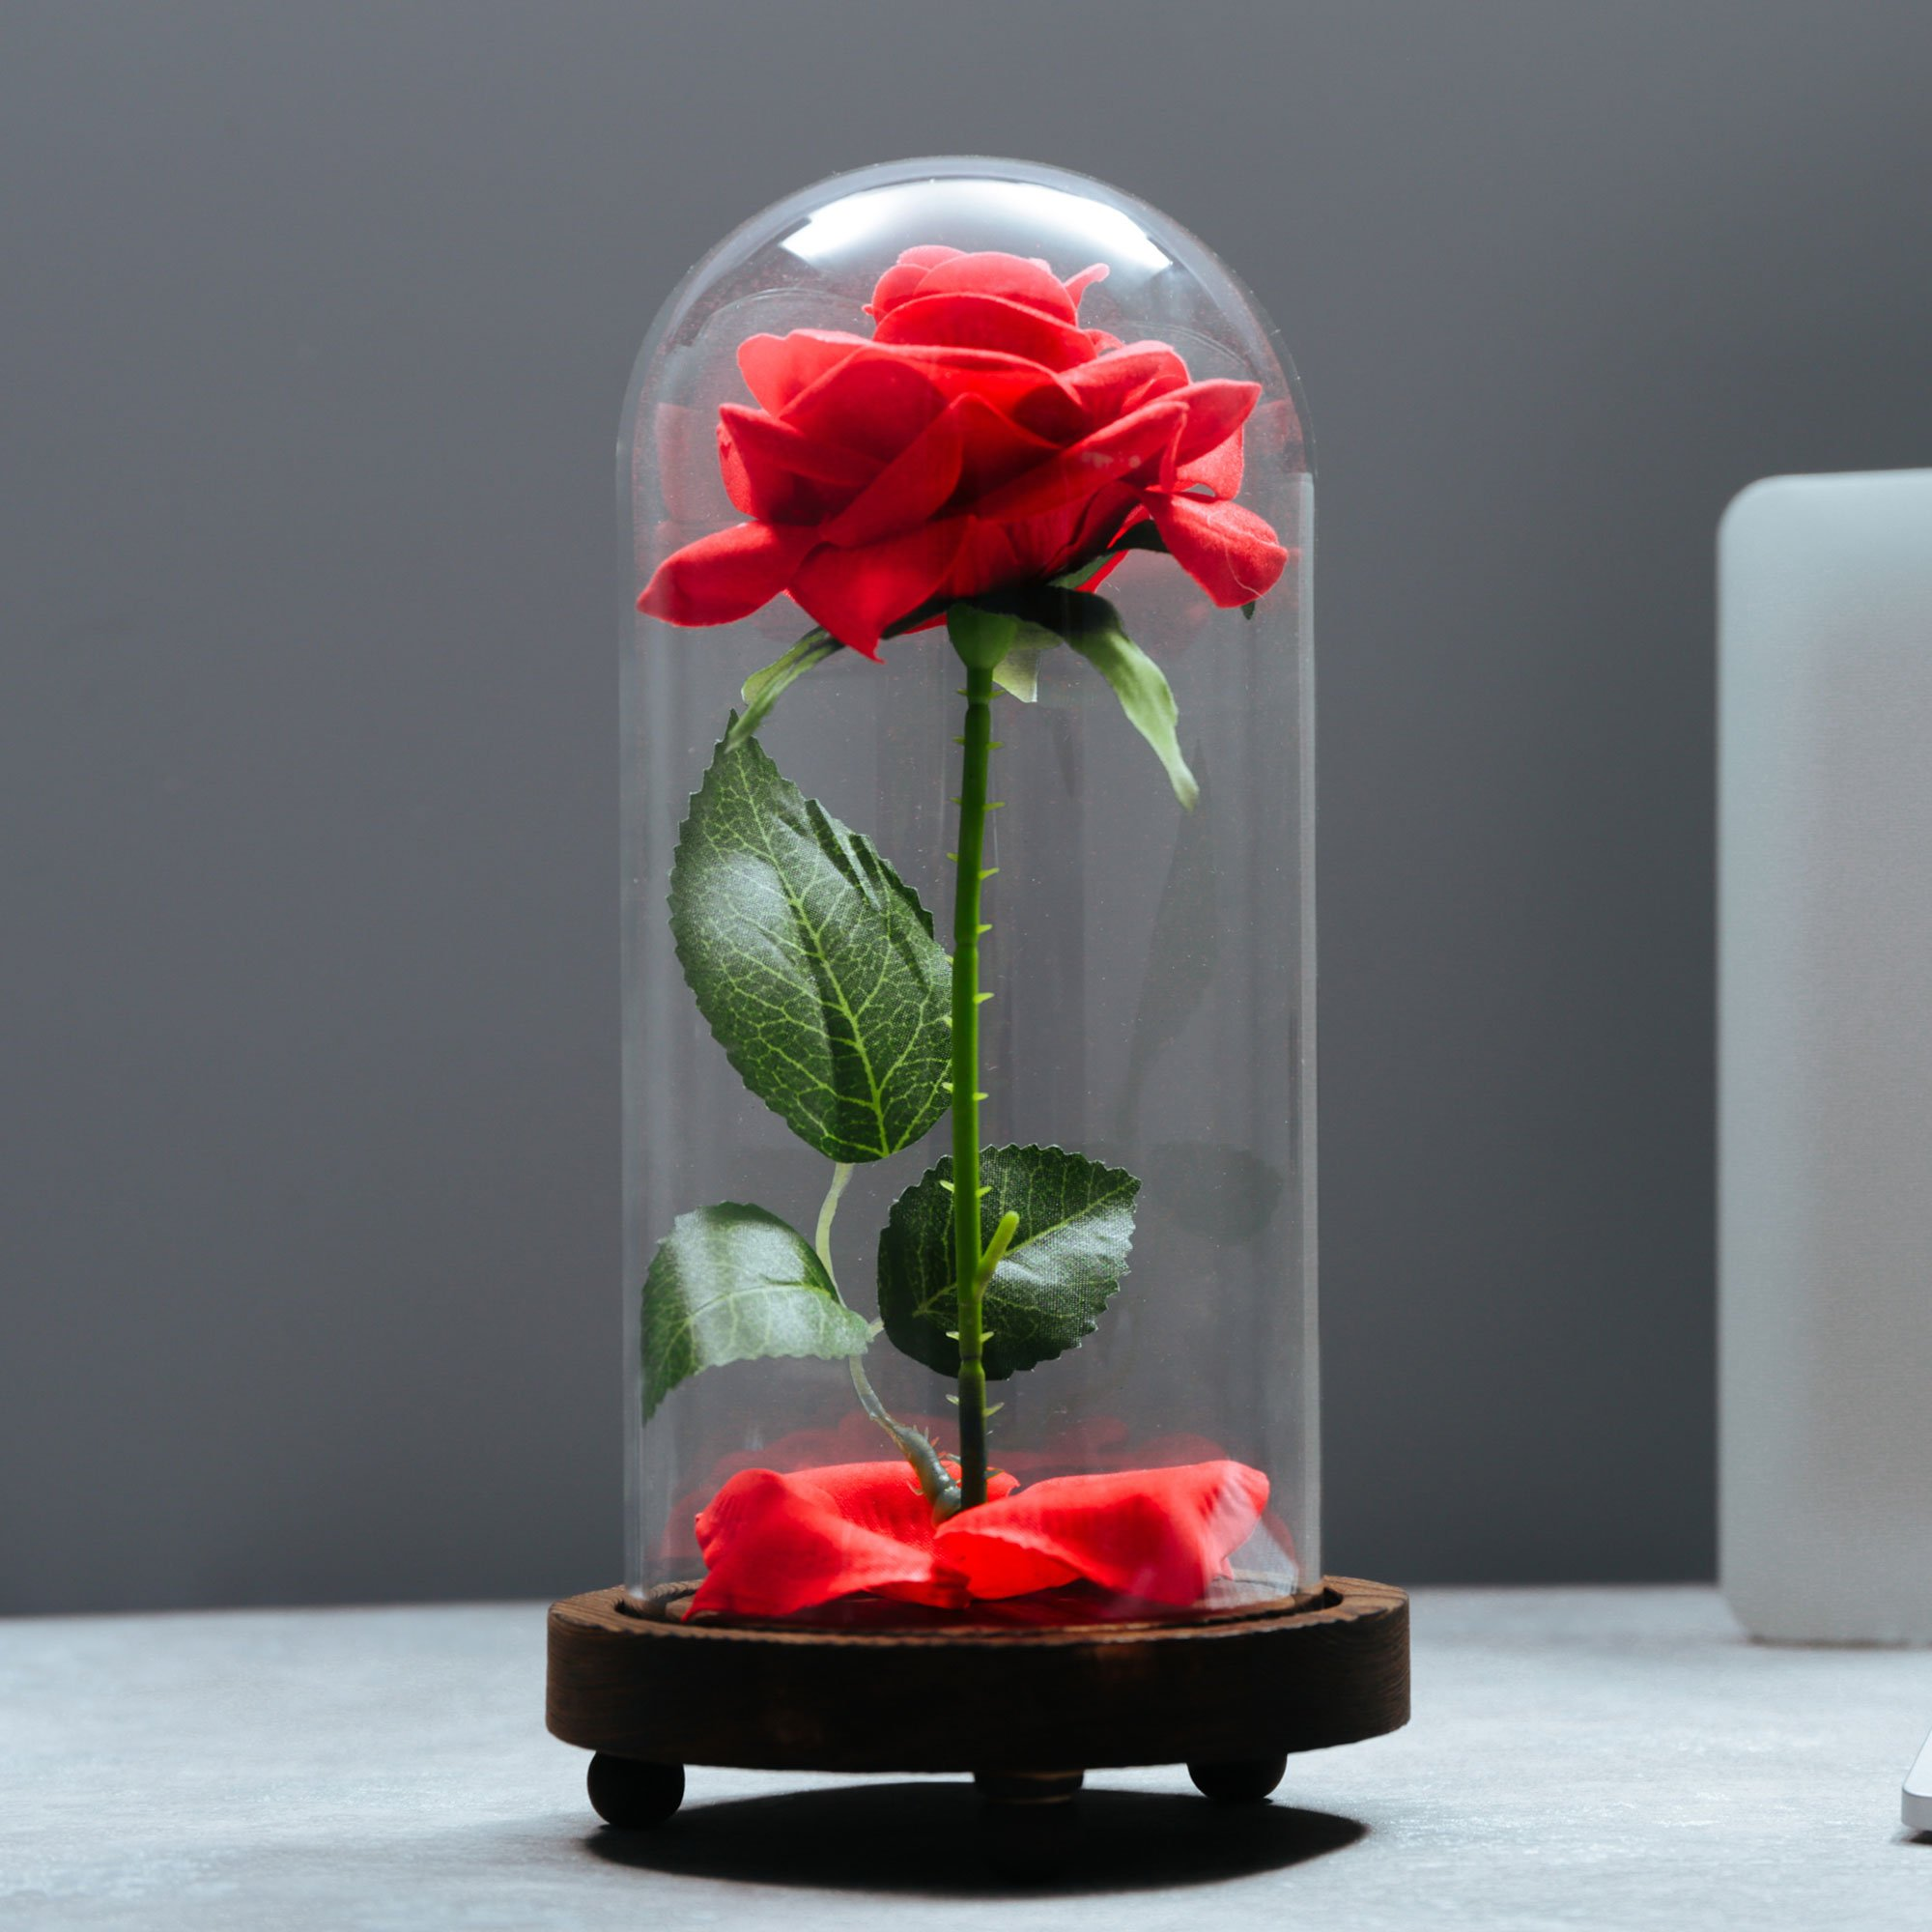 Amazon Handheld Mirror With Handle For Vanity Makeup Home